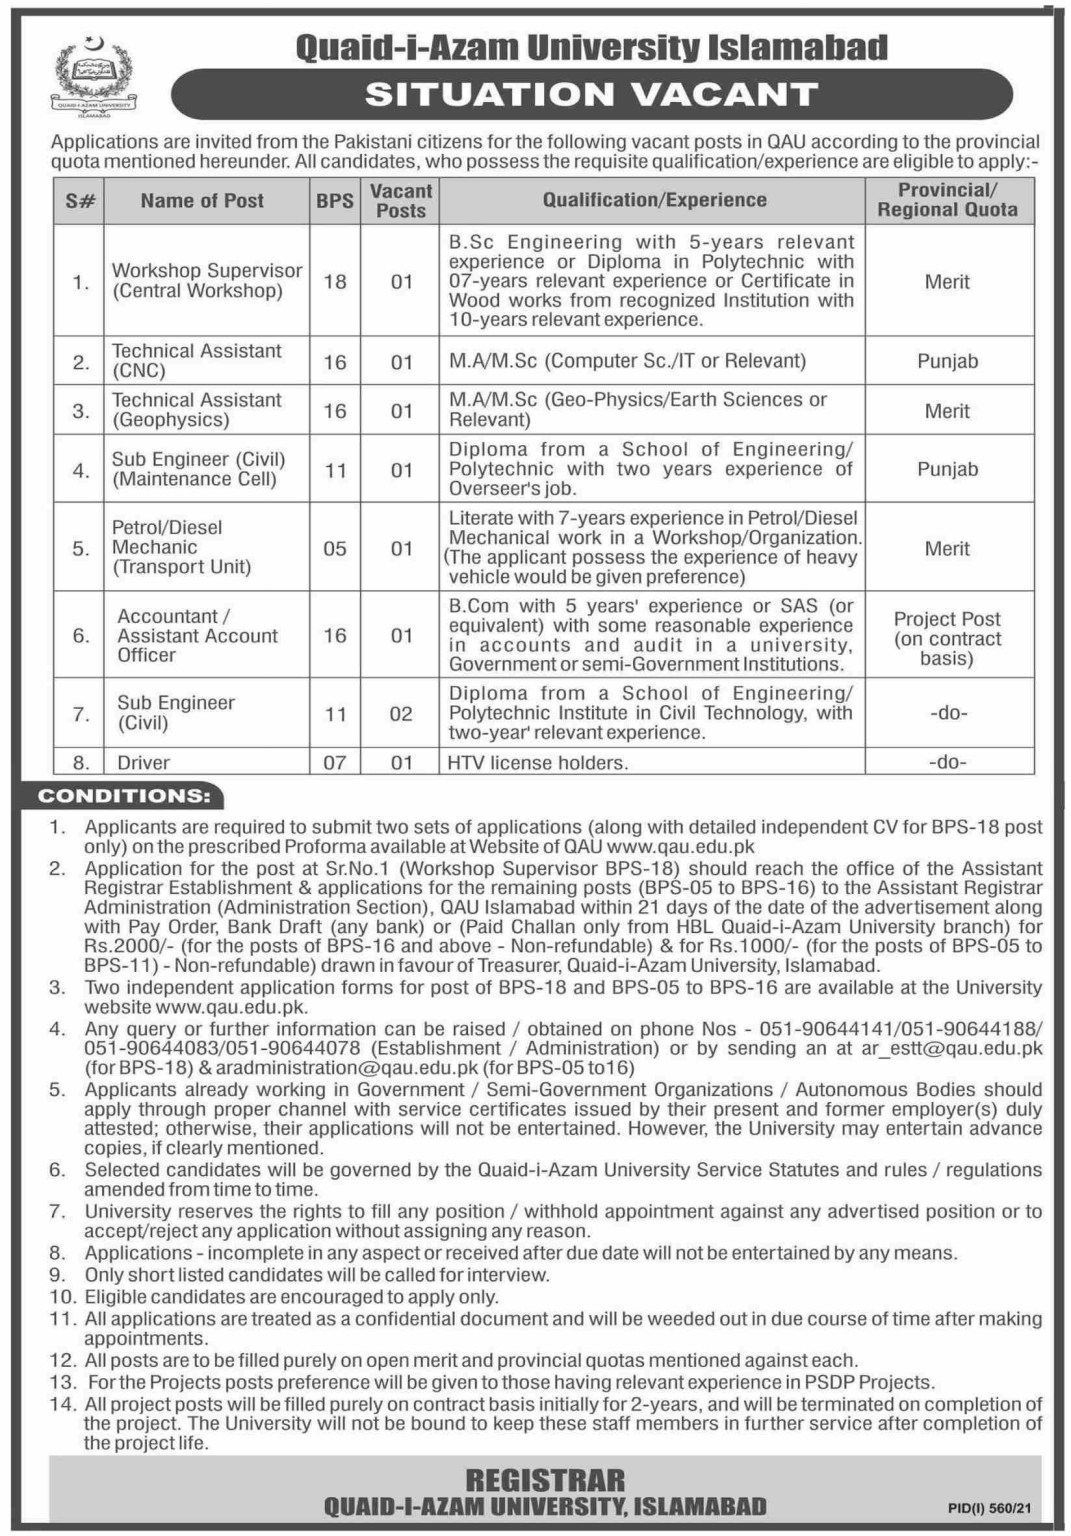 www.qau.edu.pk Jobs 2021 - Quaid E Azam University Islamabad Jobs 2021 in Pakistan